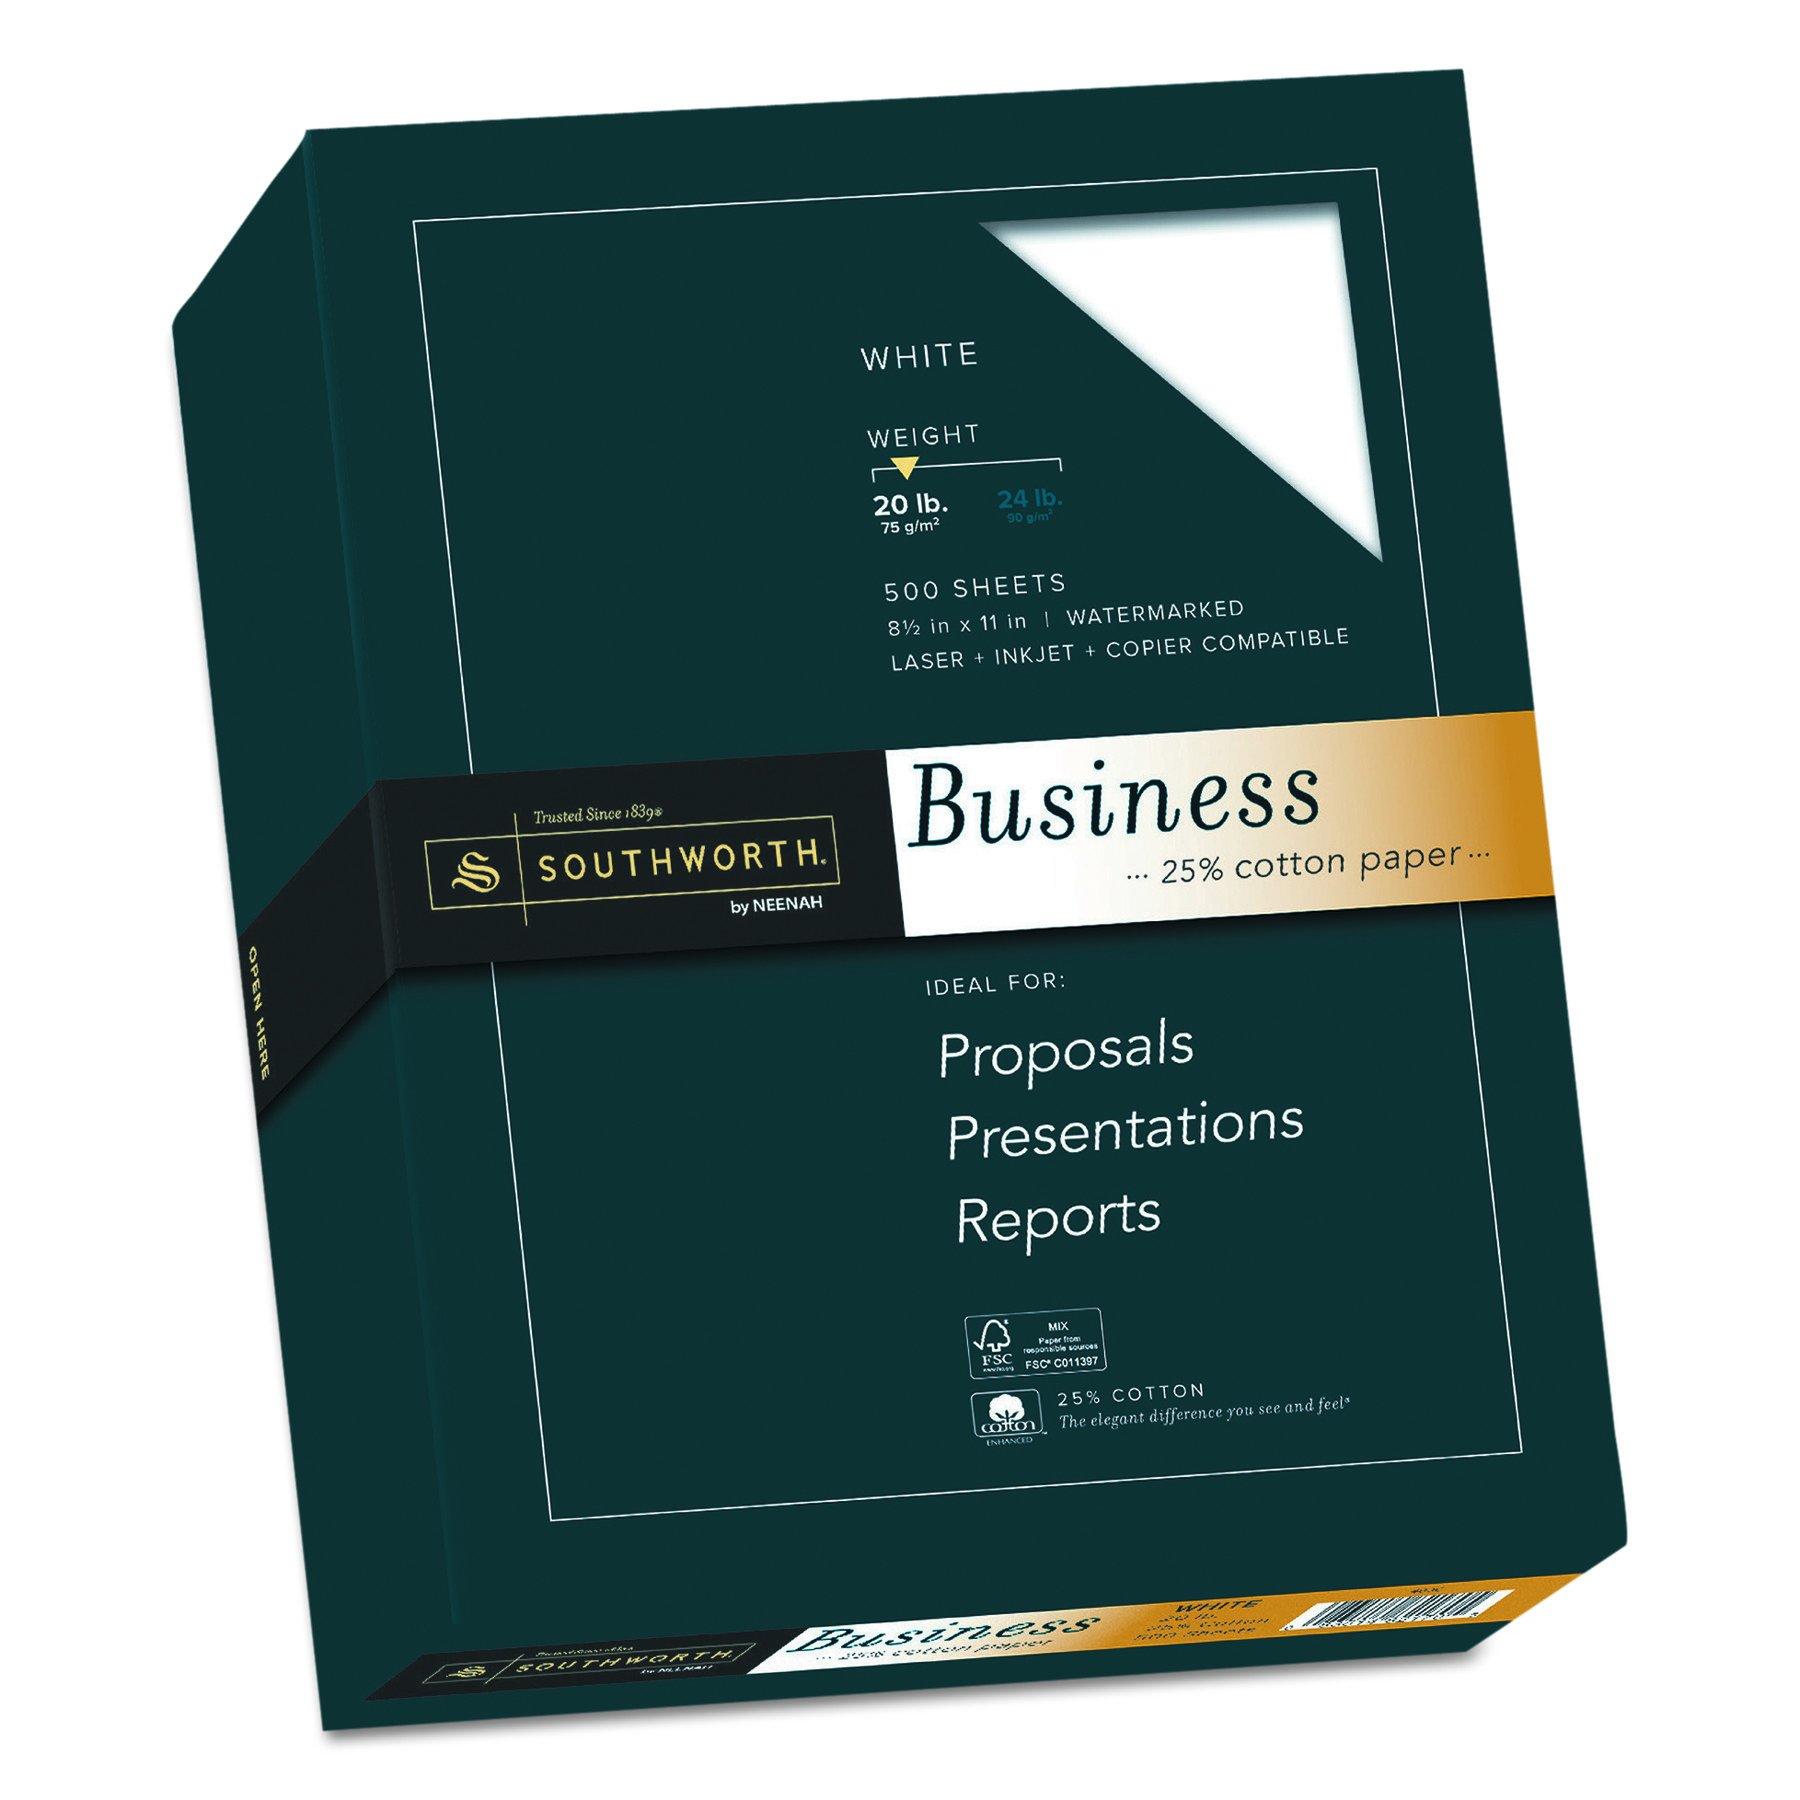 Southworth Fine Business Paper, 20.05 Cotton, 20 lb , White,500 Sheets (403C) by Southworth